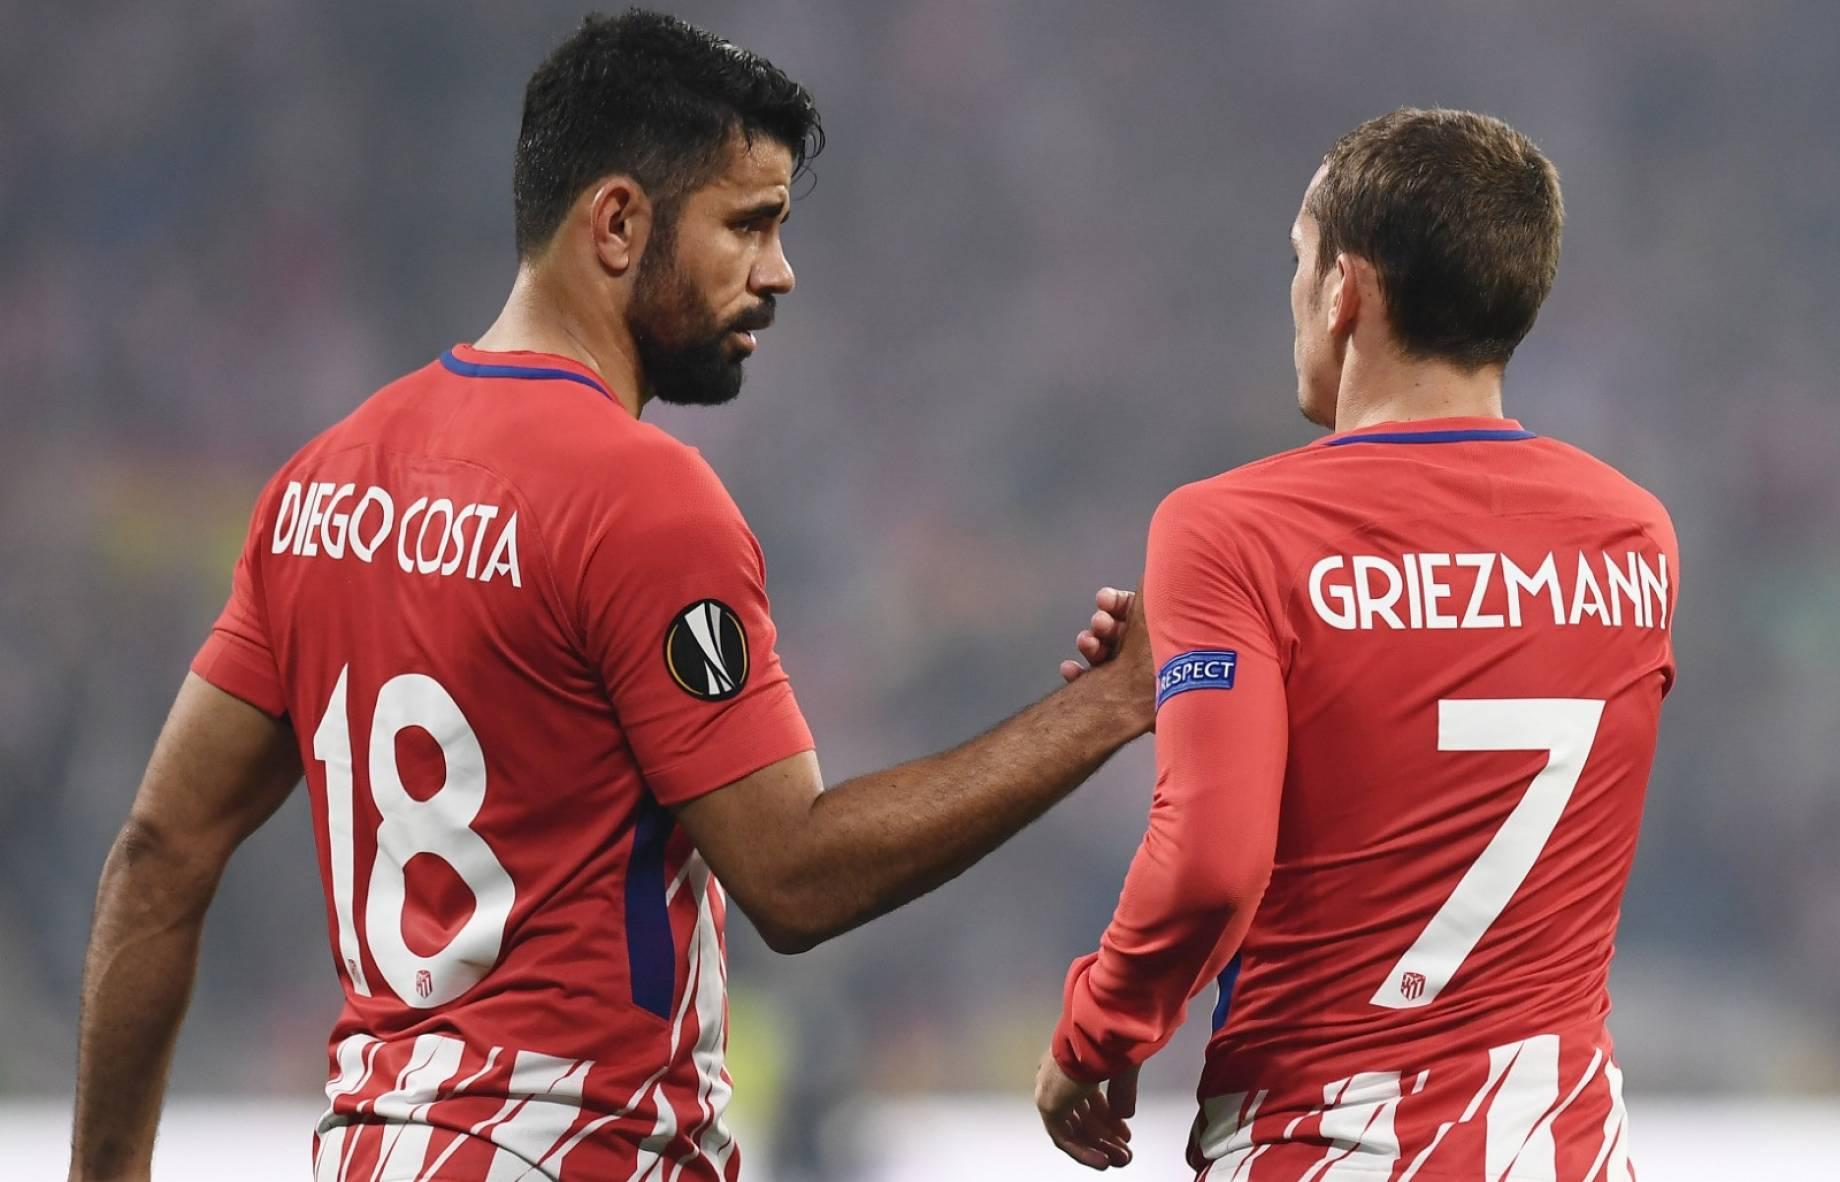 Diego Costa e Griezmann Atletico Madrid IMAGE.jpg